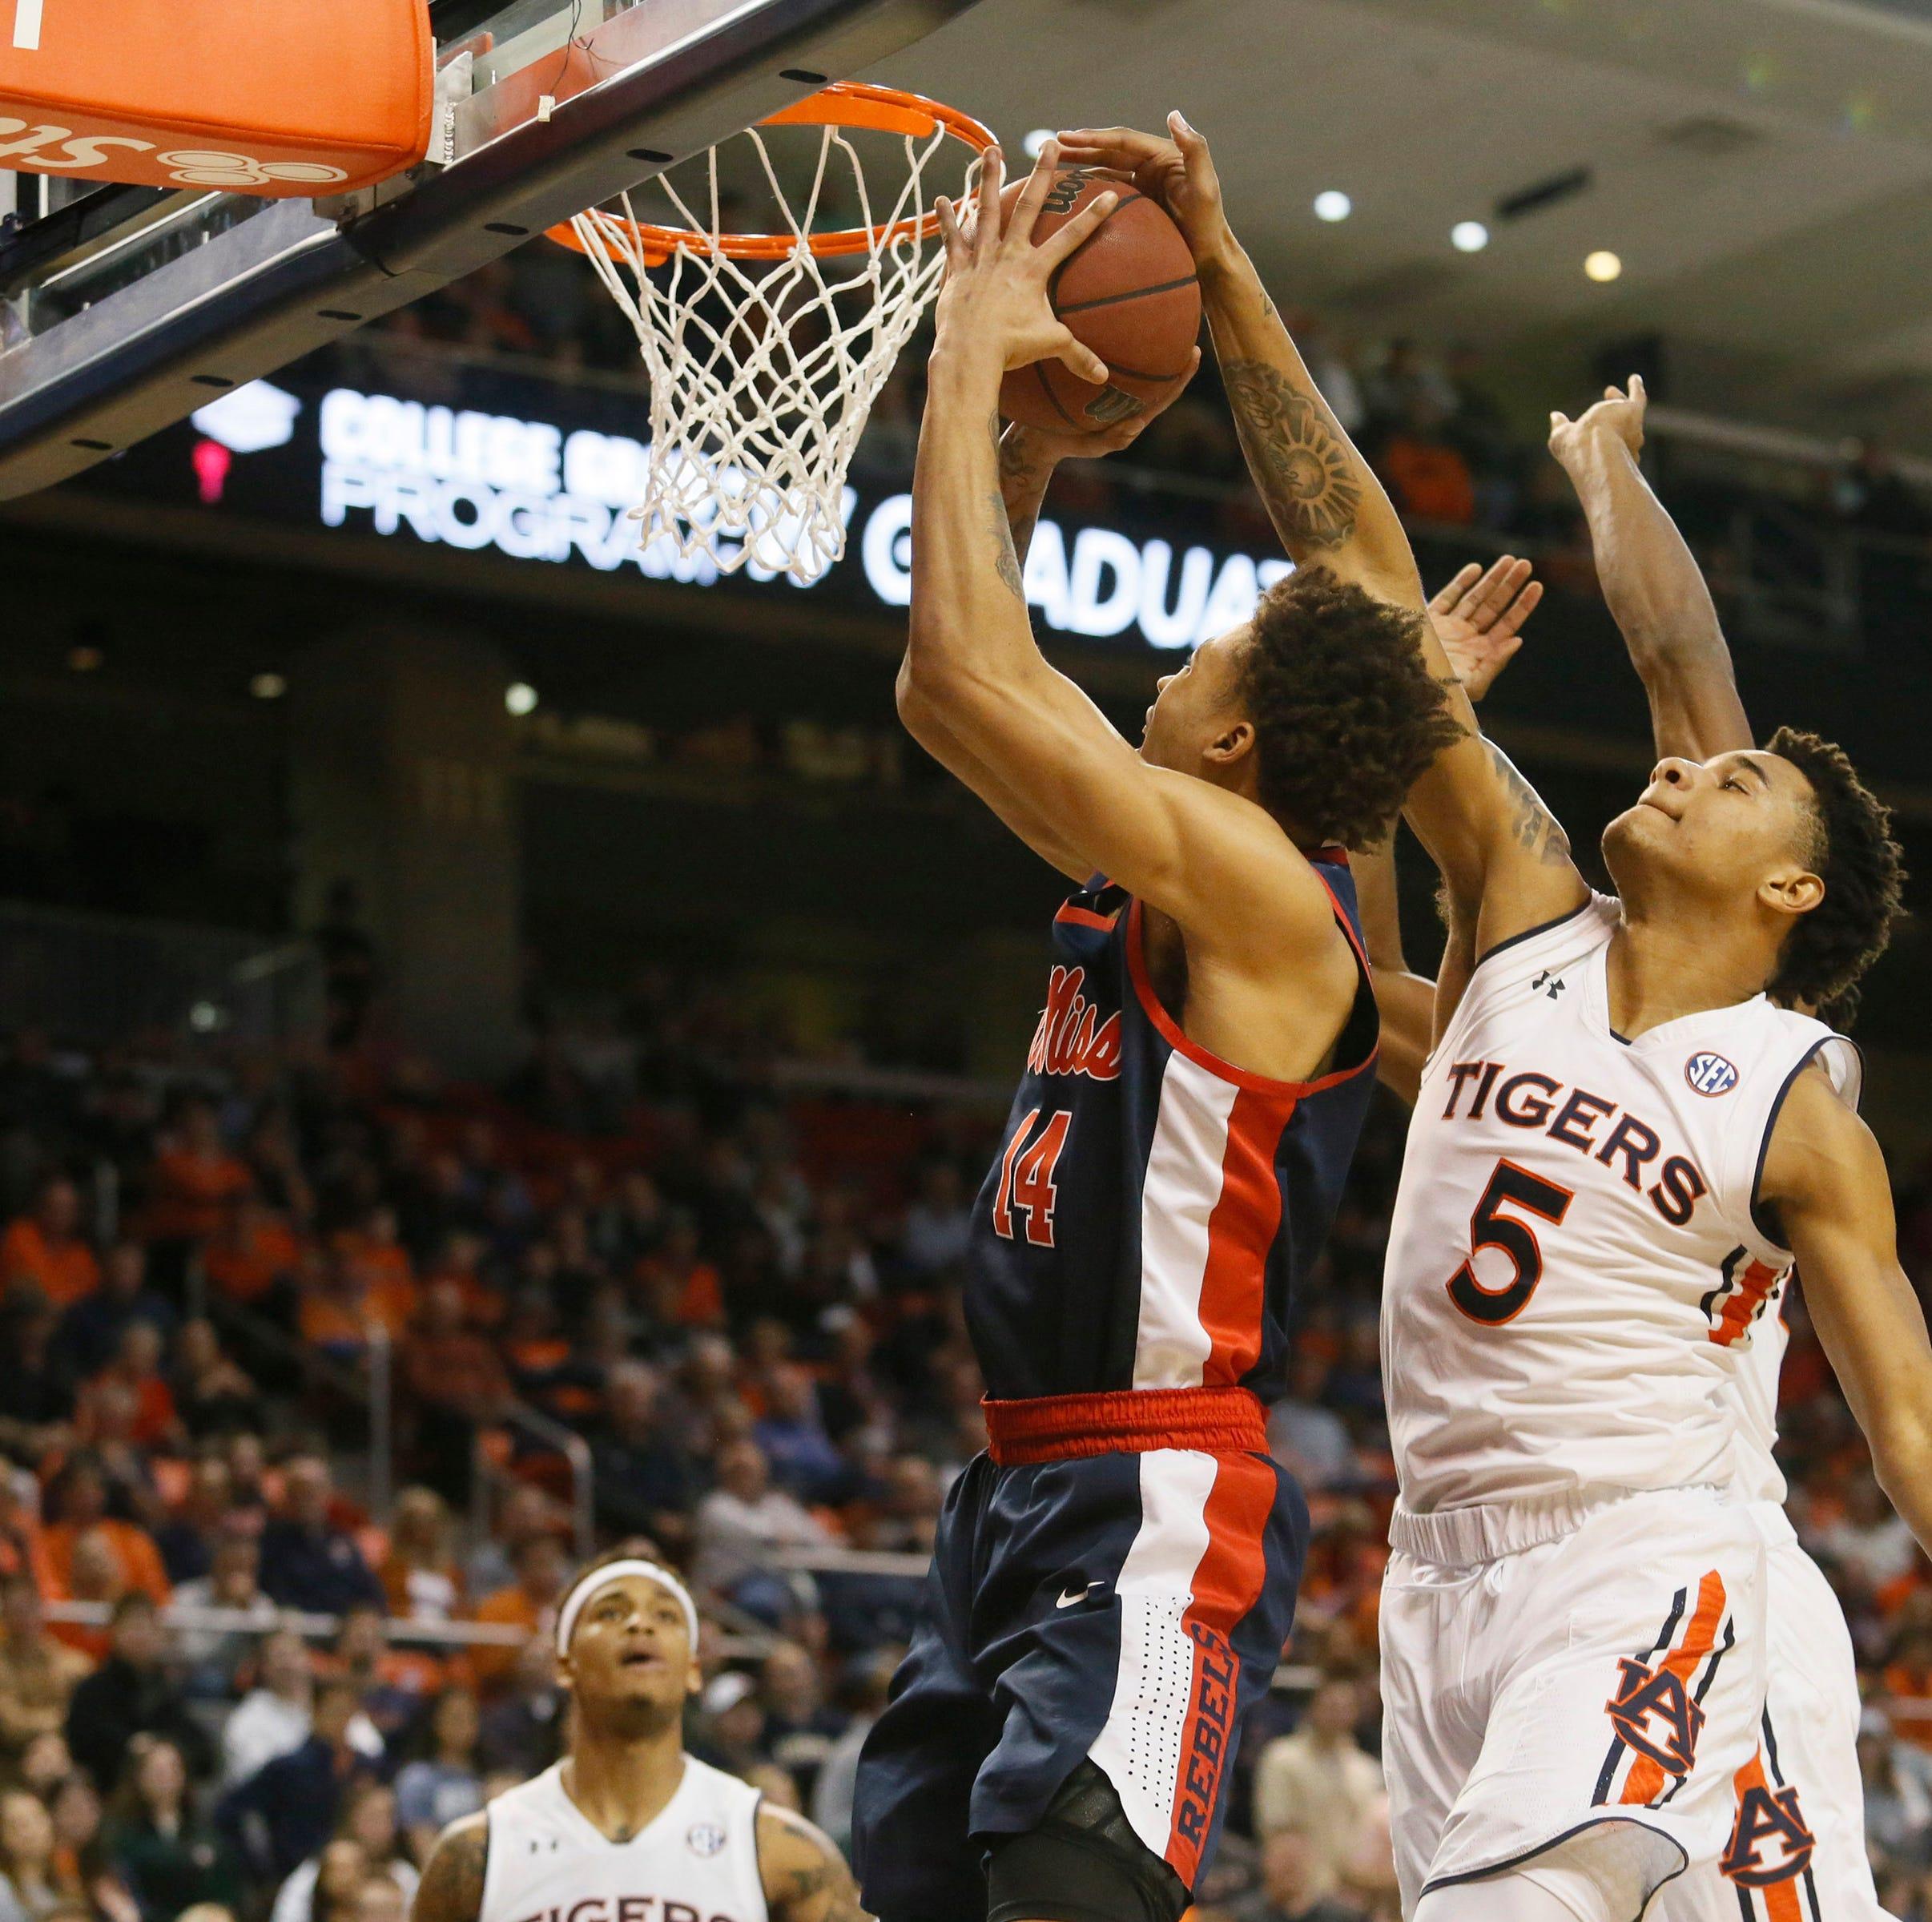 3 takeaways from Auburn's second home loss of the season vs. Ole Miss